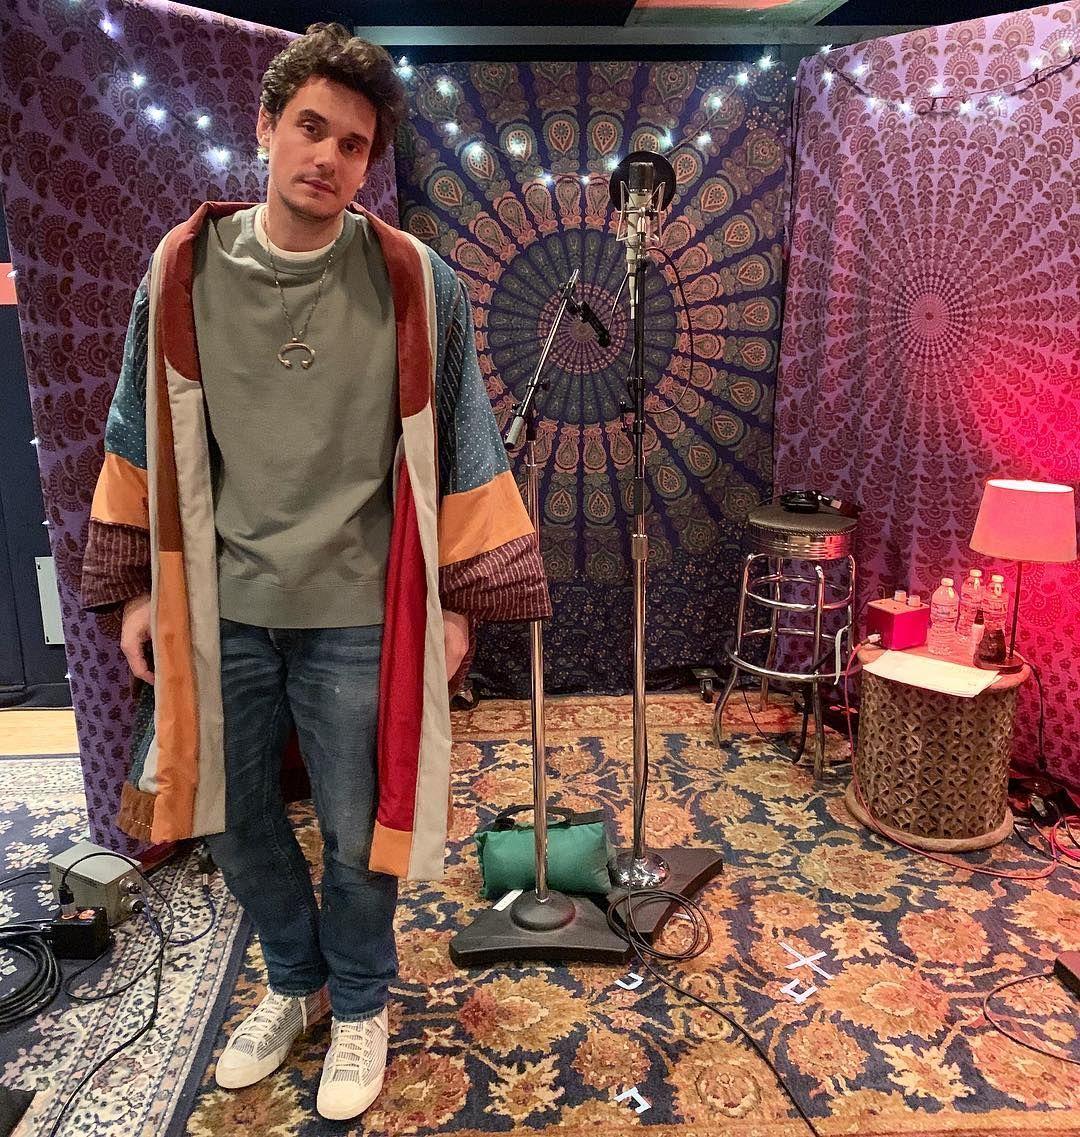 5 Fakta Konser John Mayer yang Perlu Kamu Tahu